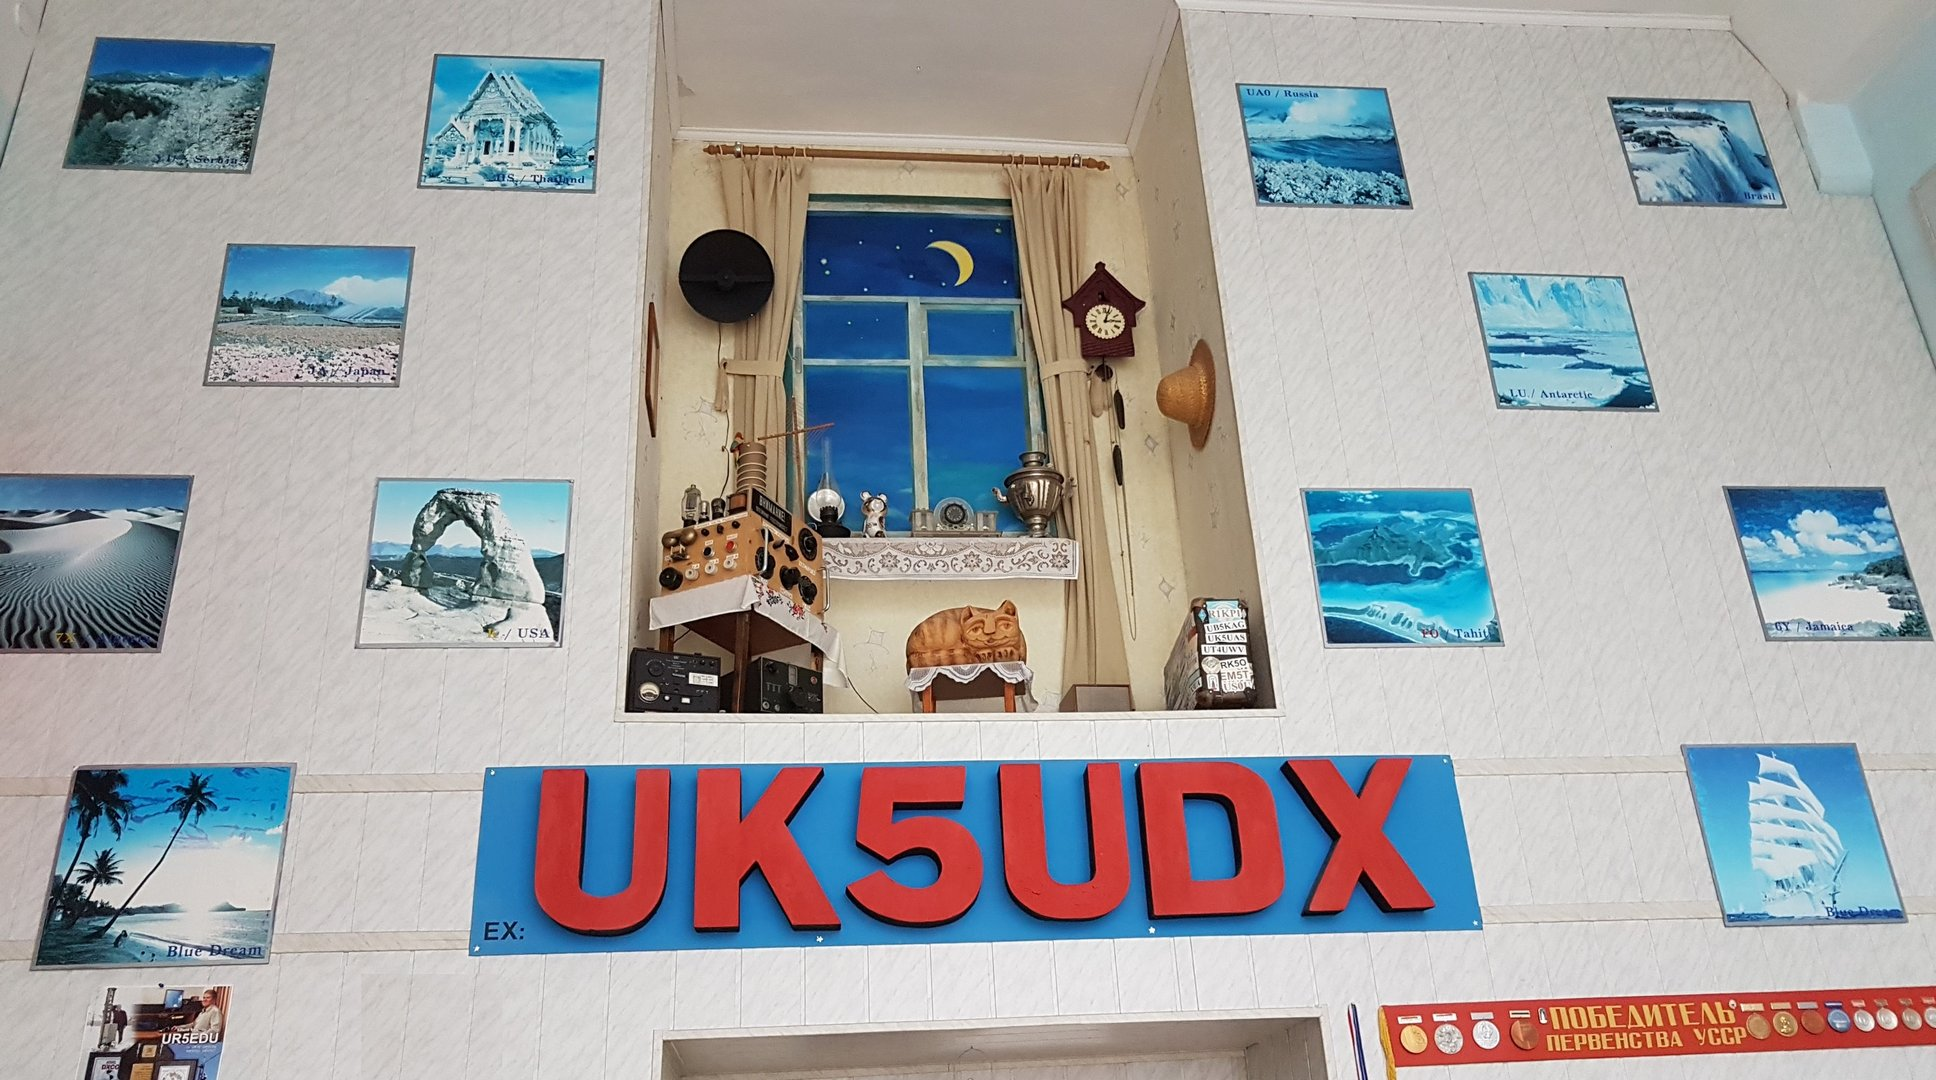 Нажмите на изображение для увеличения.  Название:UK5UDX Заставка.jpg Просмотров:3 Размер:368.2 Кб ID:194805